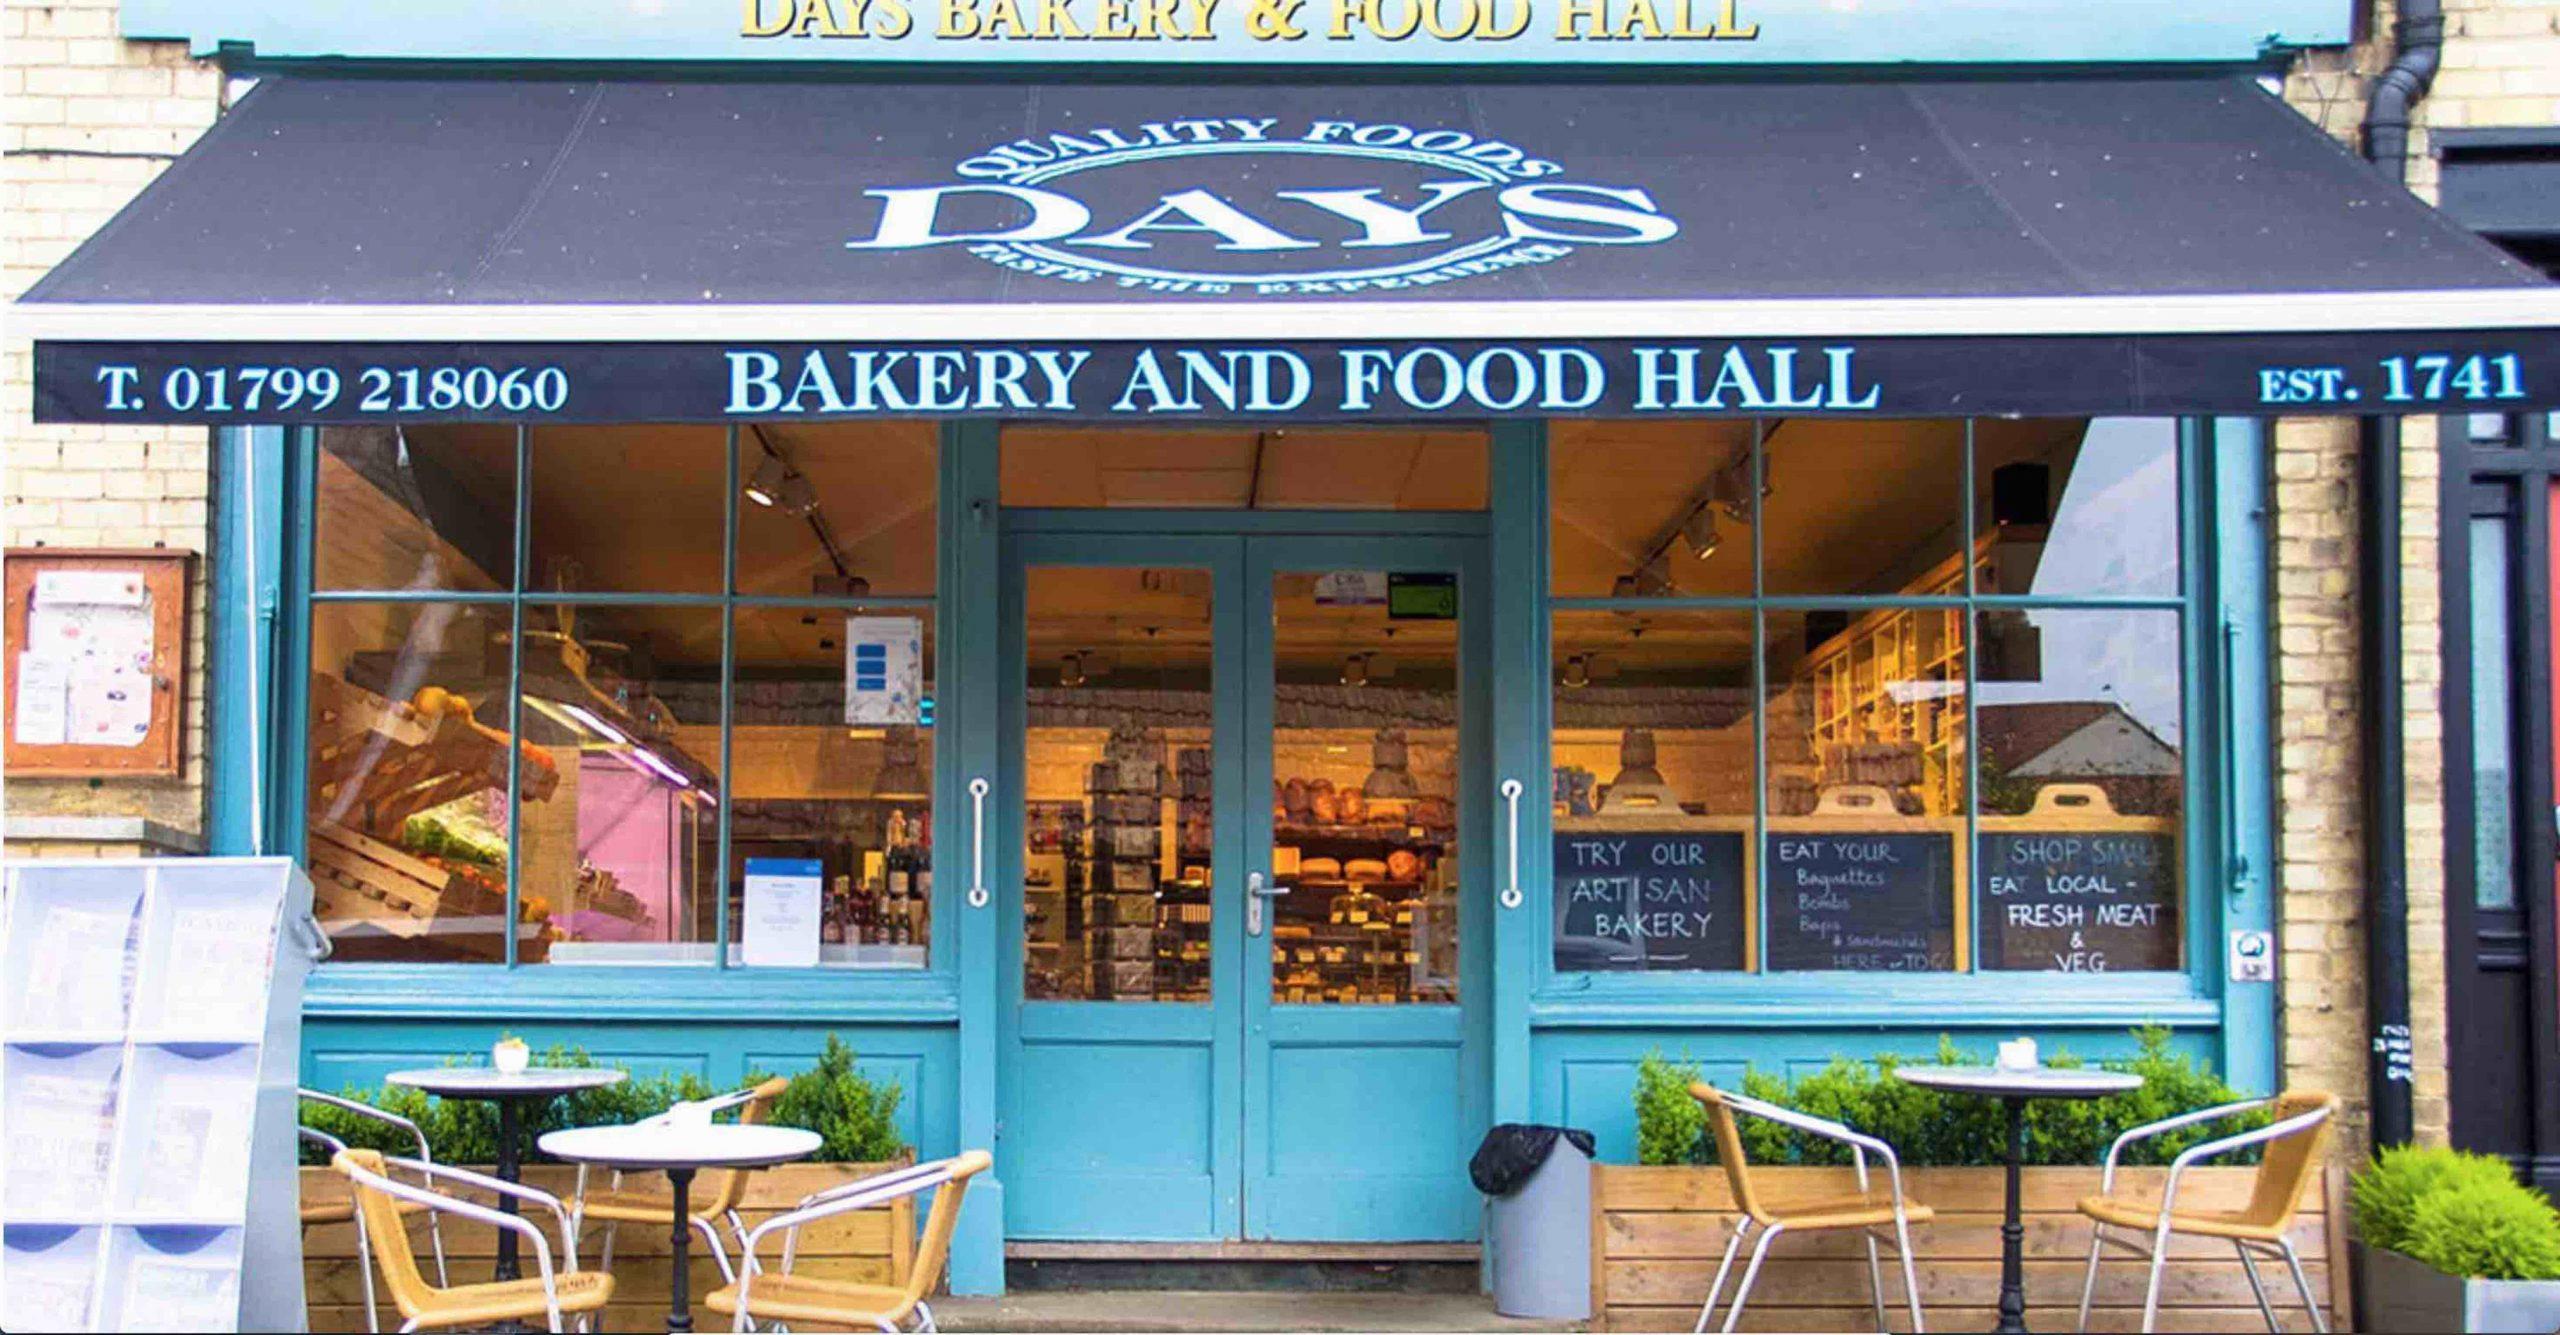 Store-shop-Hertfordshire-days-bakery compressed-min